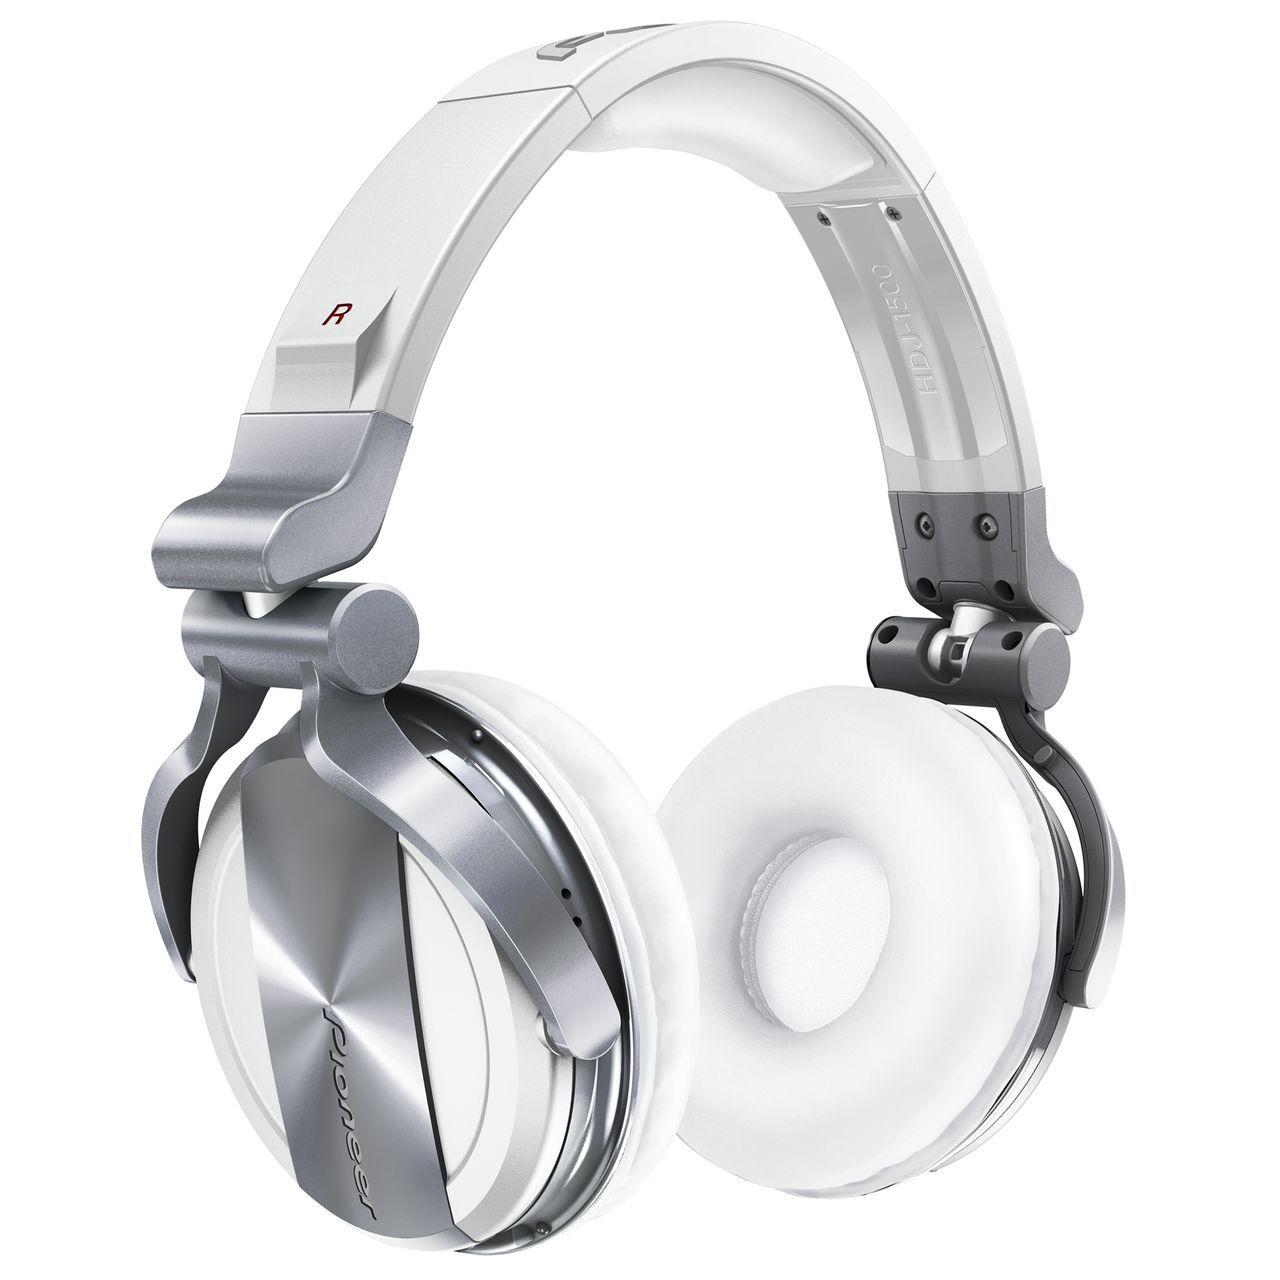 pioneer-dj-hdj-1500-w-dj-headphones-white 1 DJE0004601-000.jpg ab5a95c8c33a